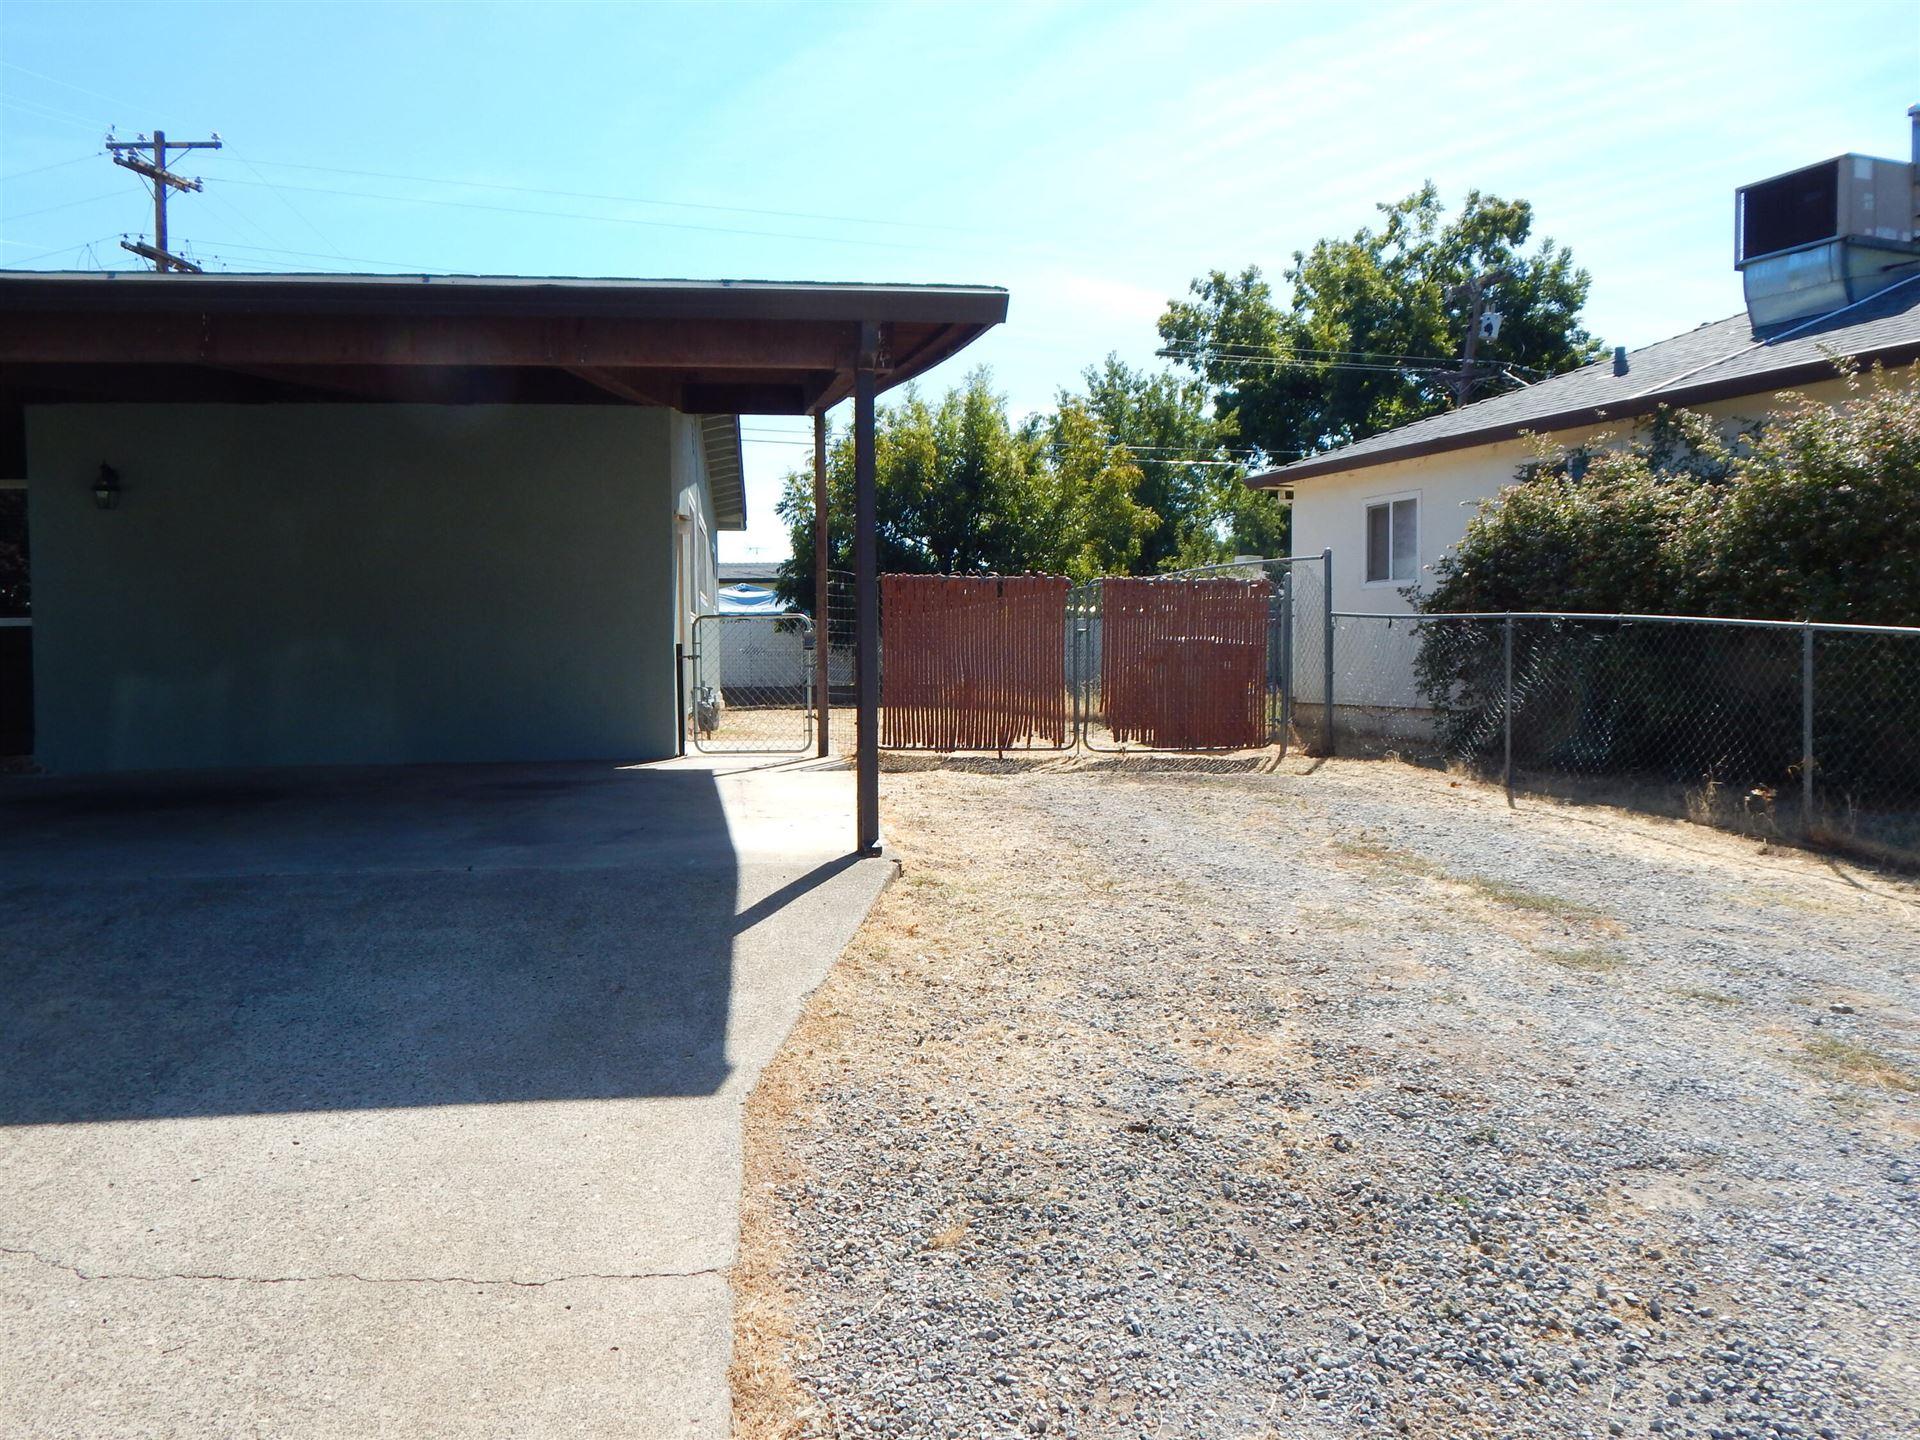 Photo of 1561 Pinon Ave, Anderson, CA 96007 (MLS # 21-4701)